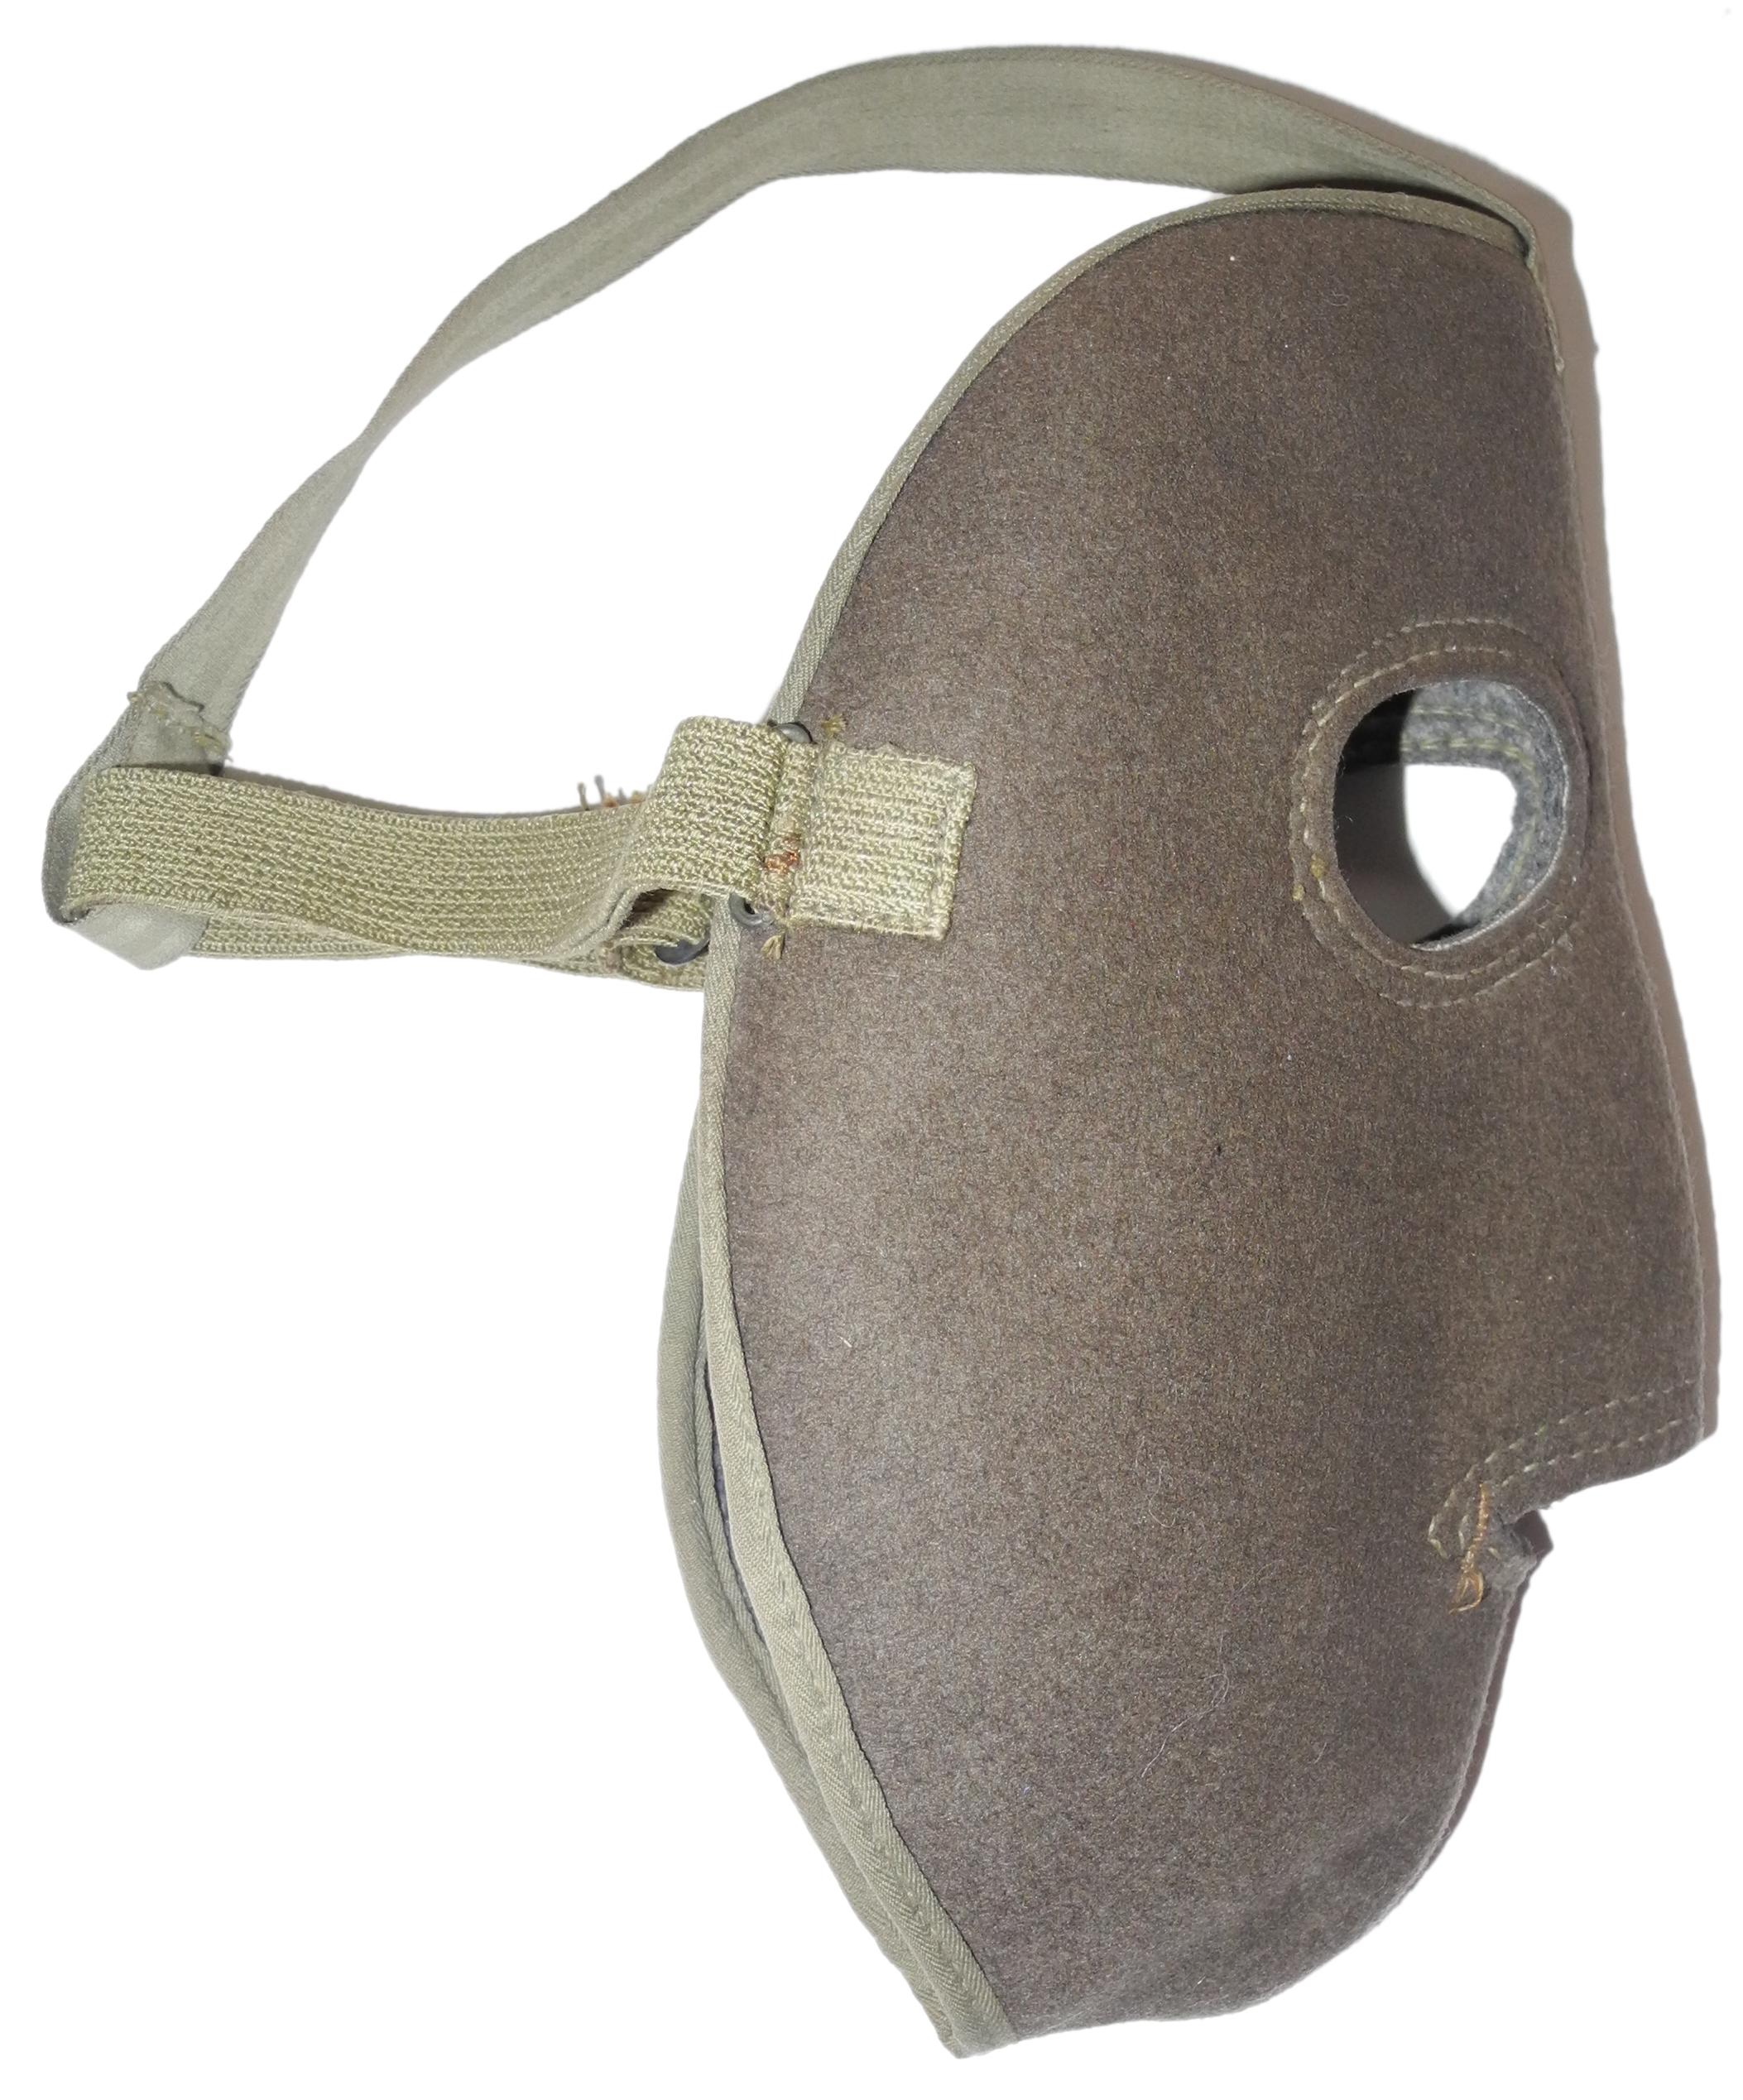 AAF D-1 Face mask